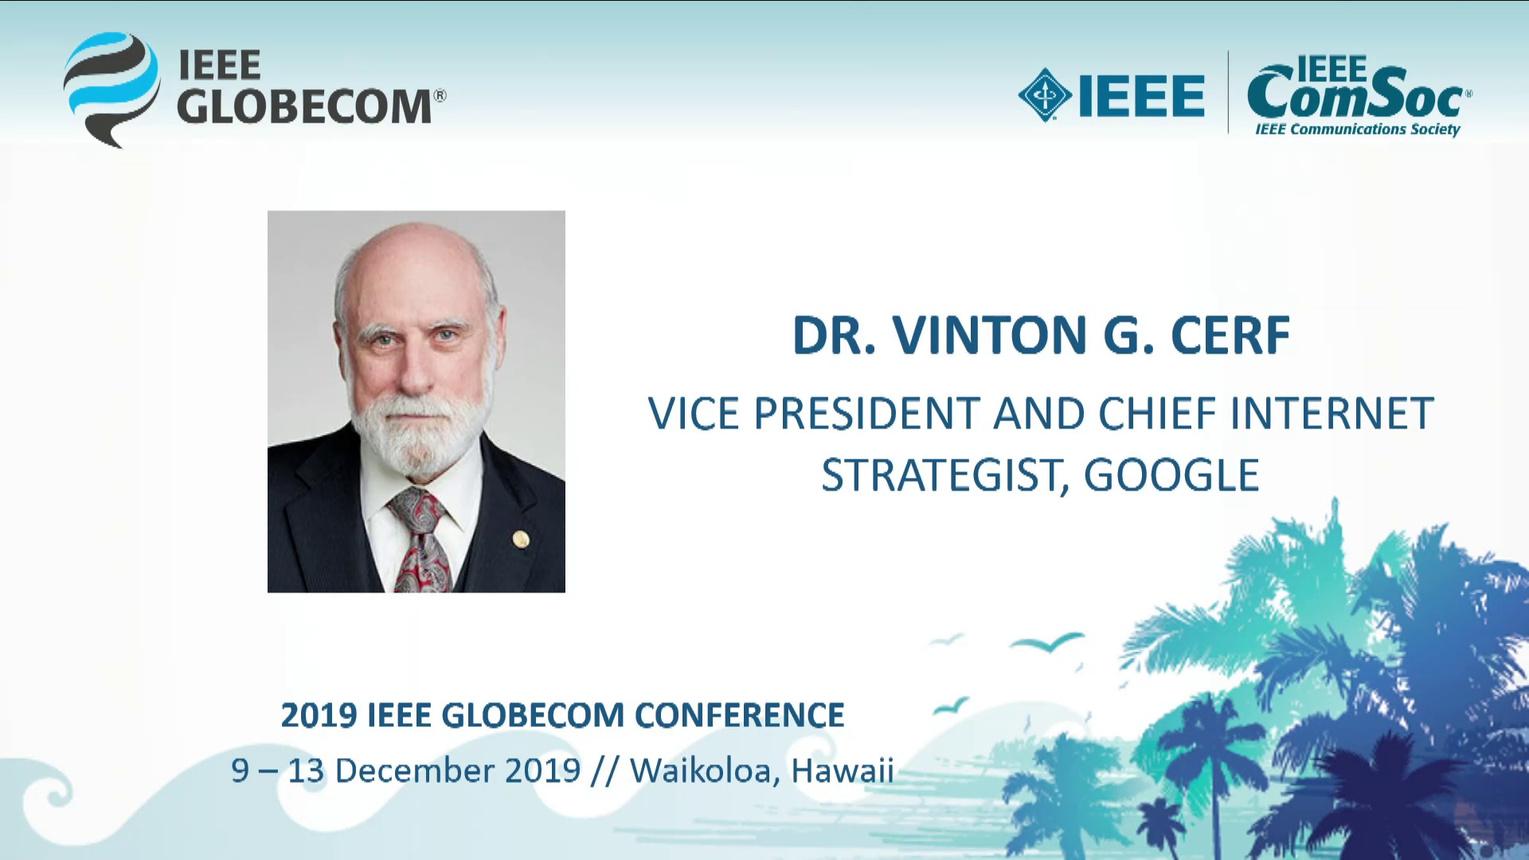 Vint Cerf: A Globecom 2019 Keynote